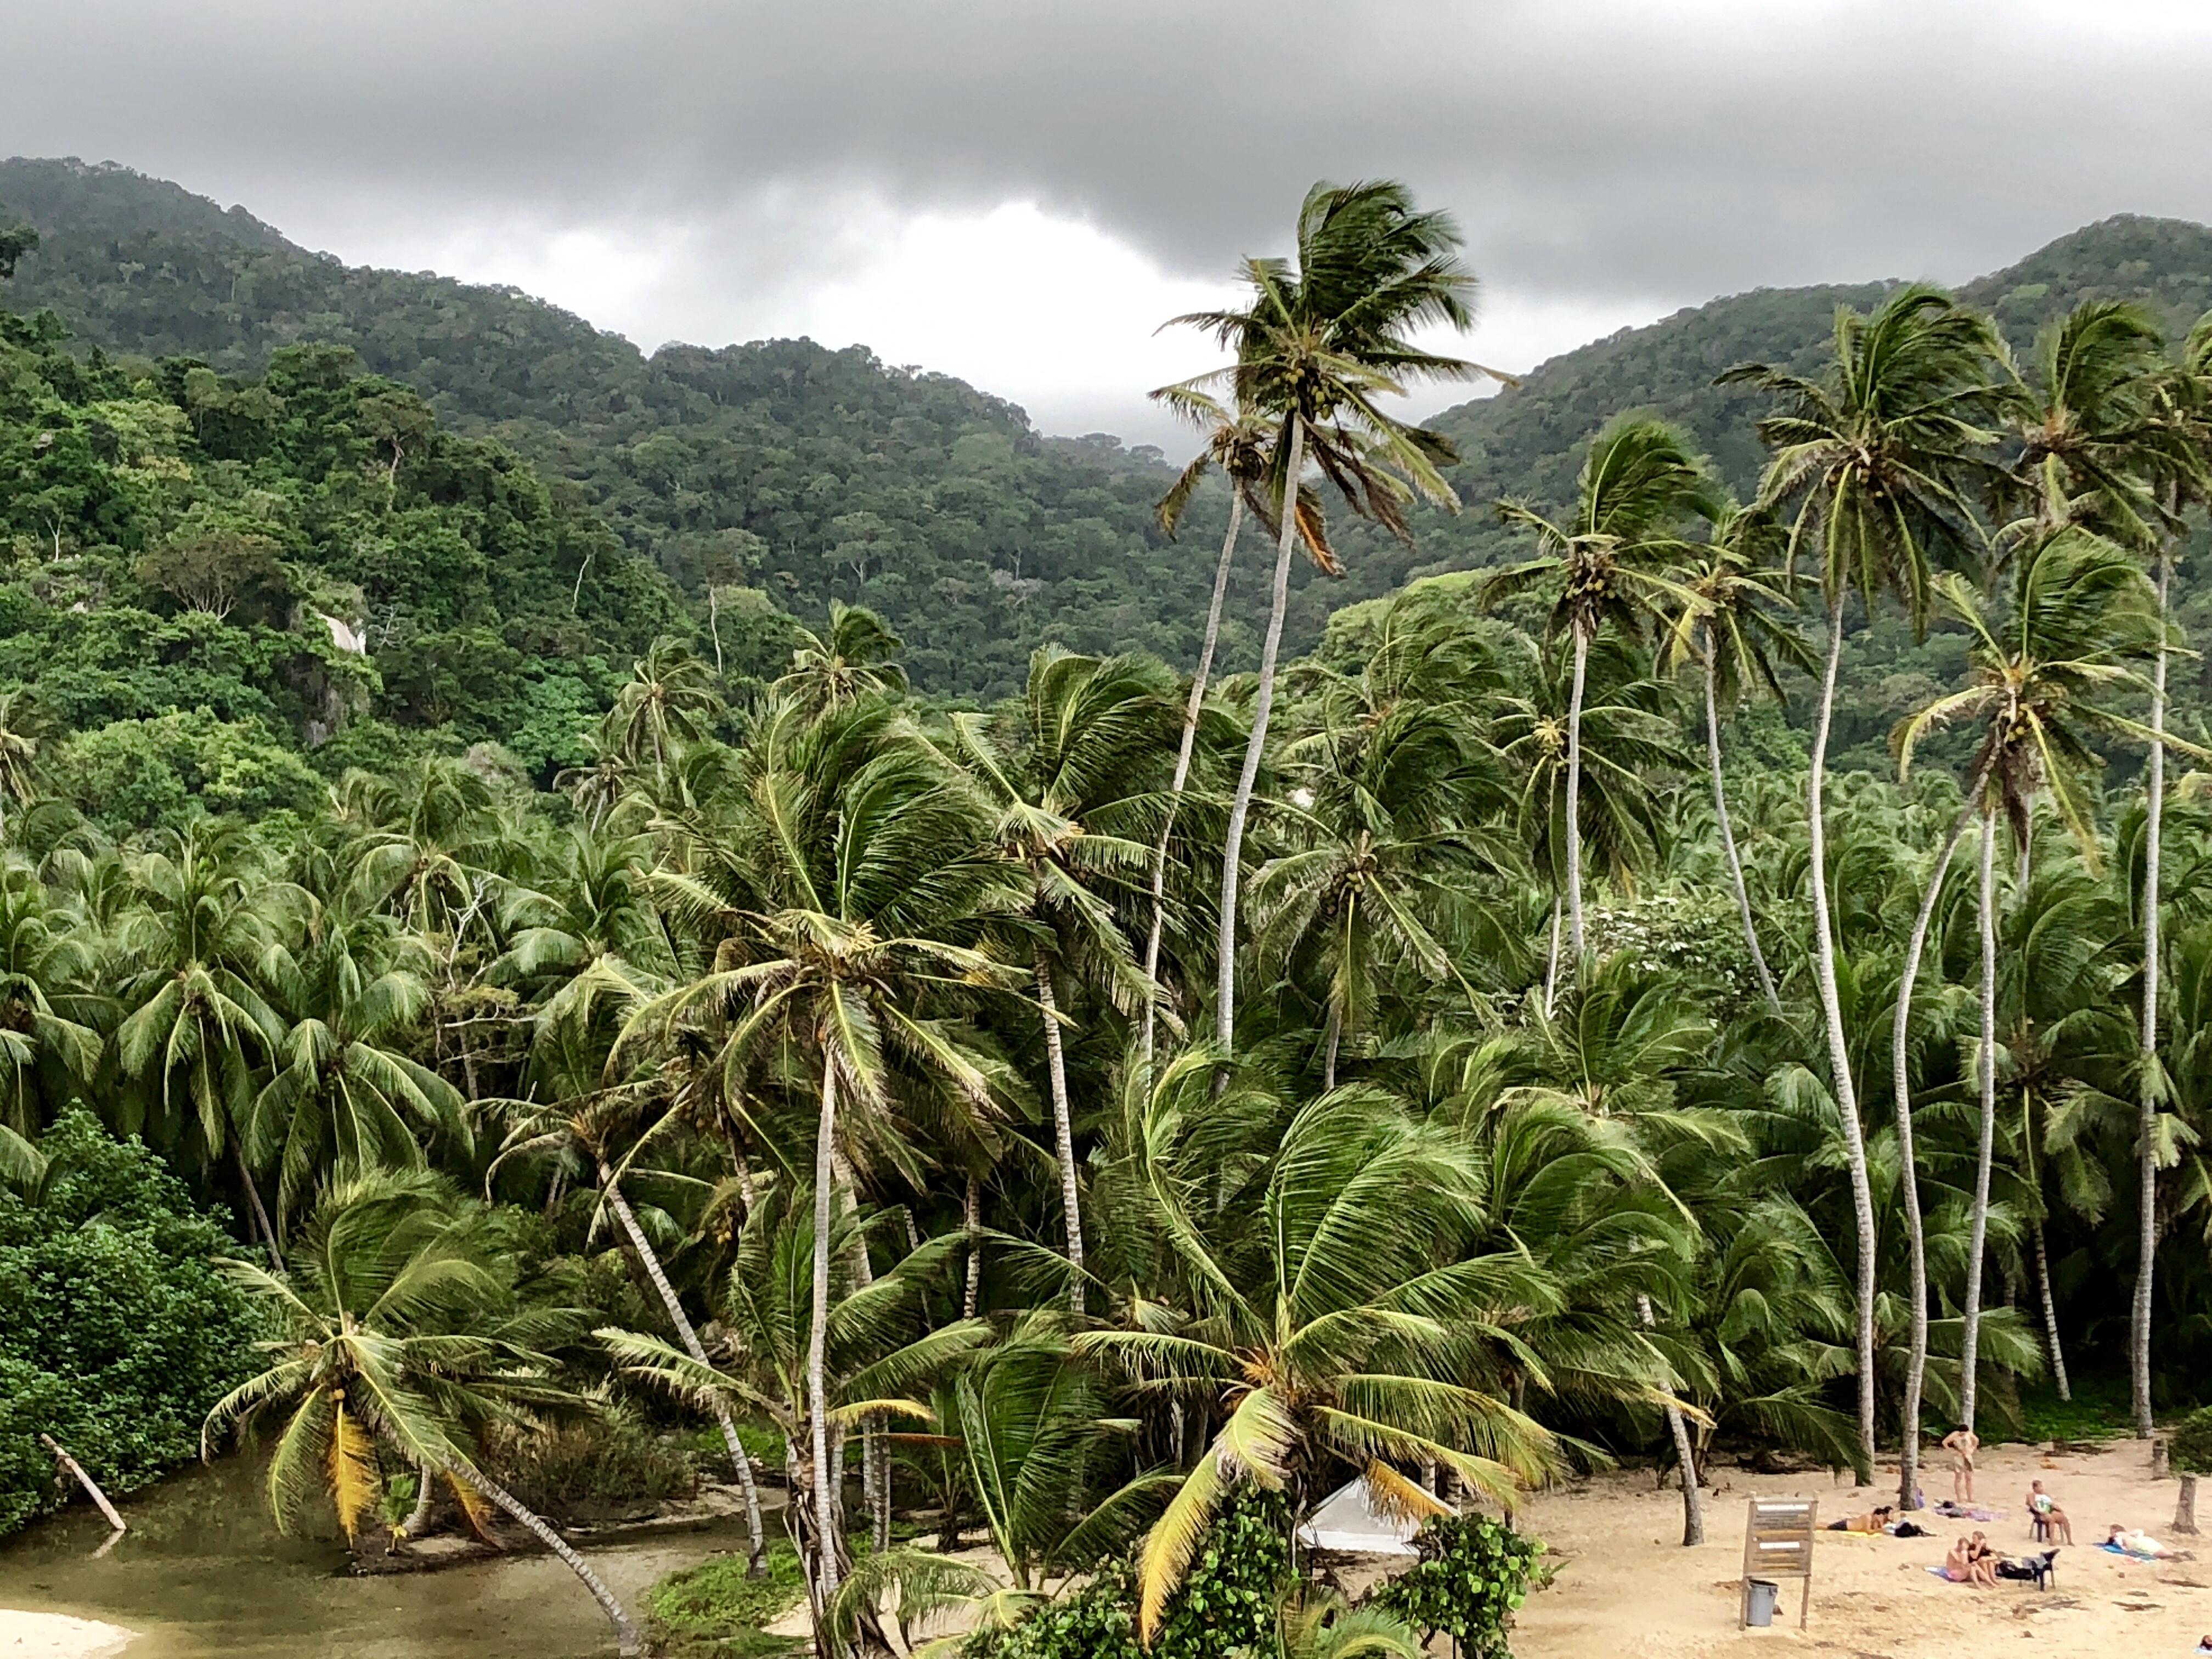 Parque de Tayrona